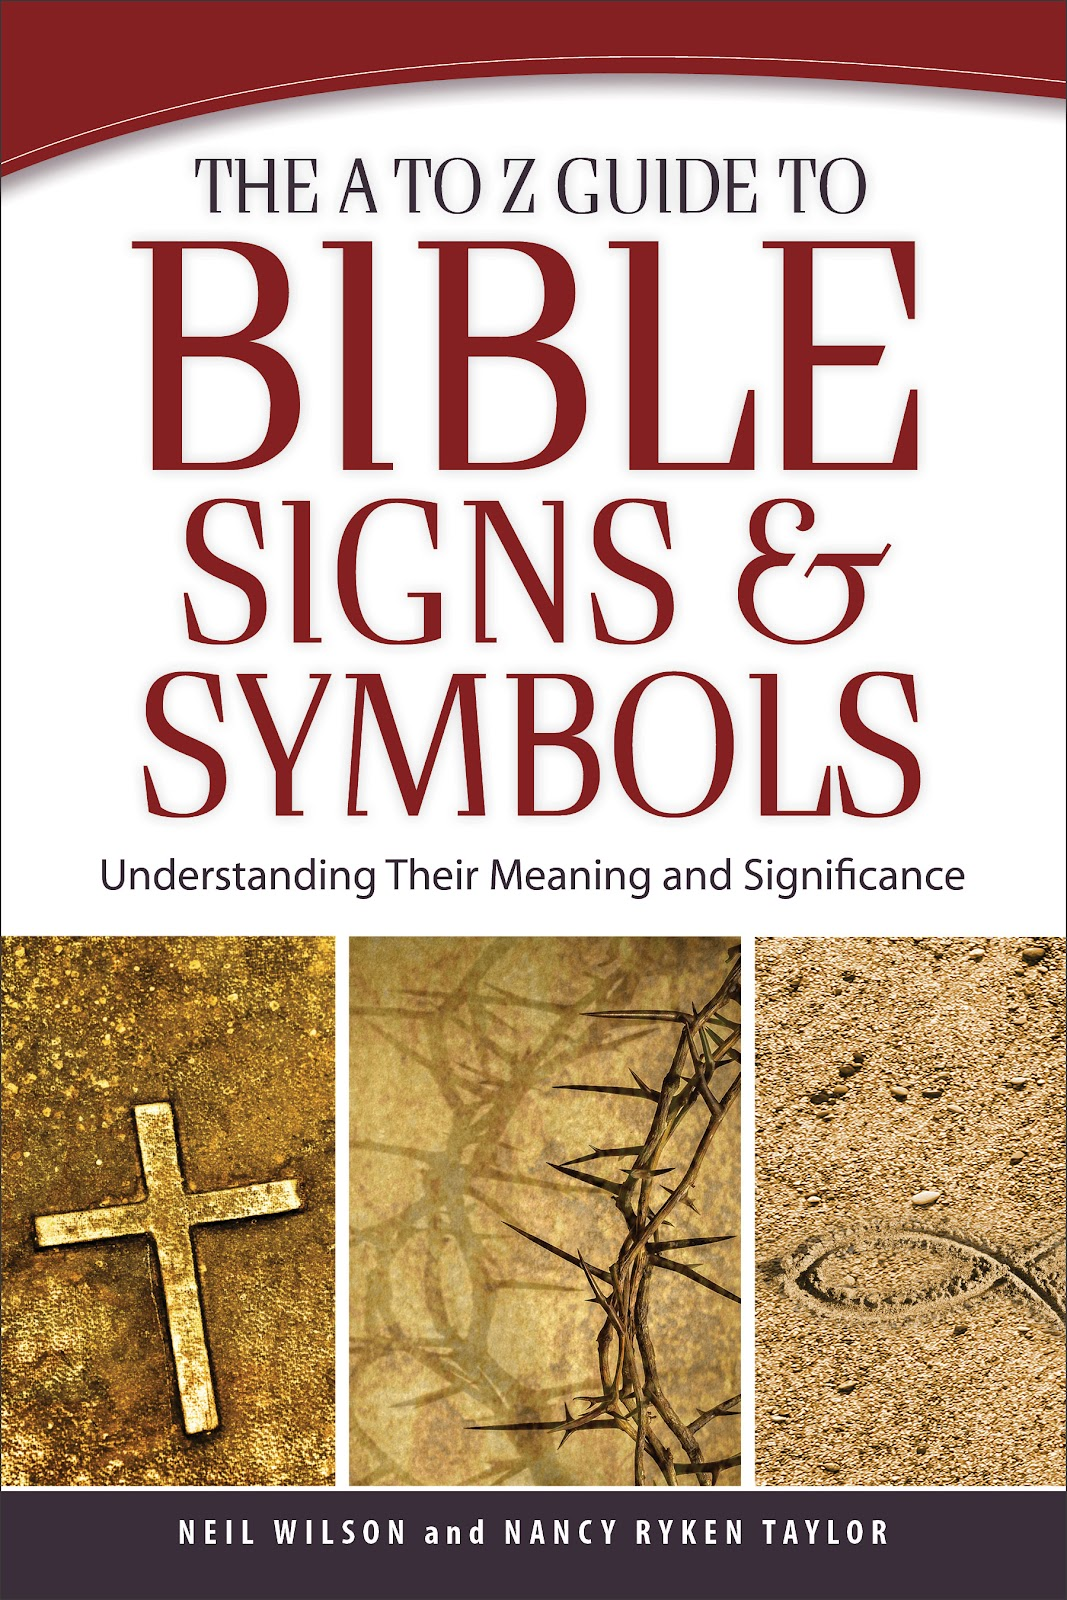 Bible Signs & Symbols.jpg